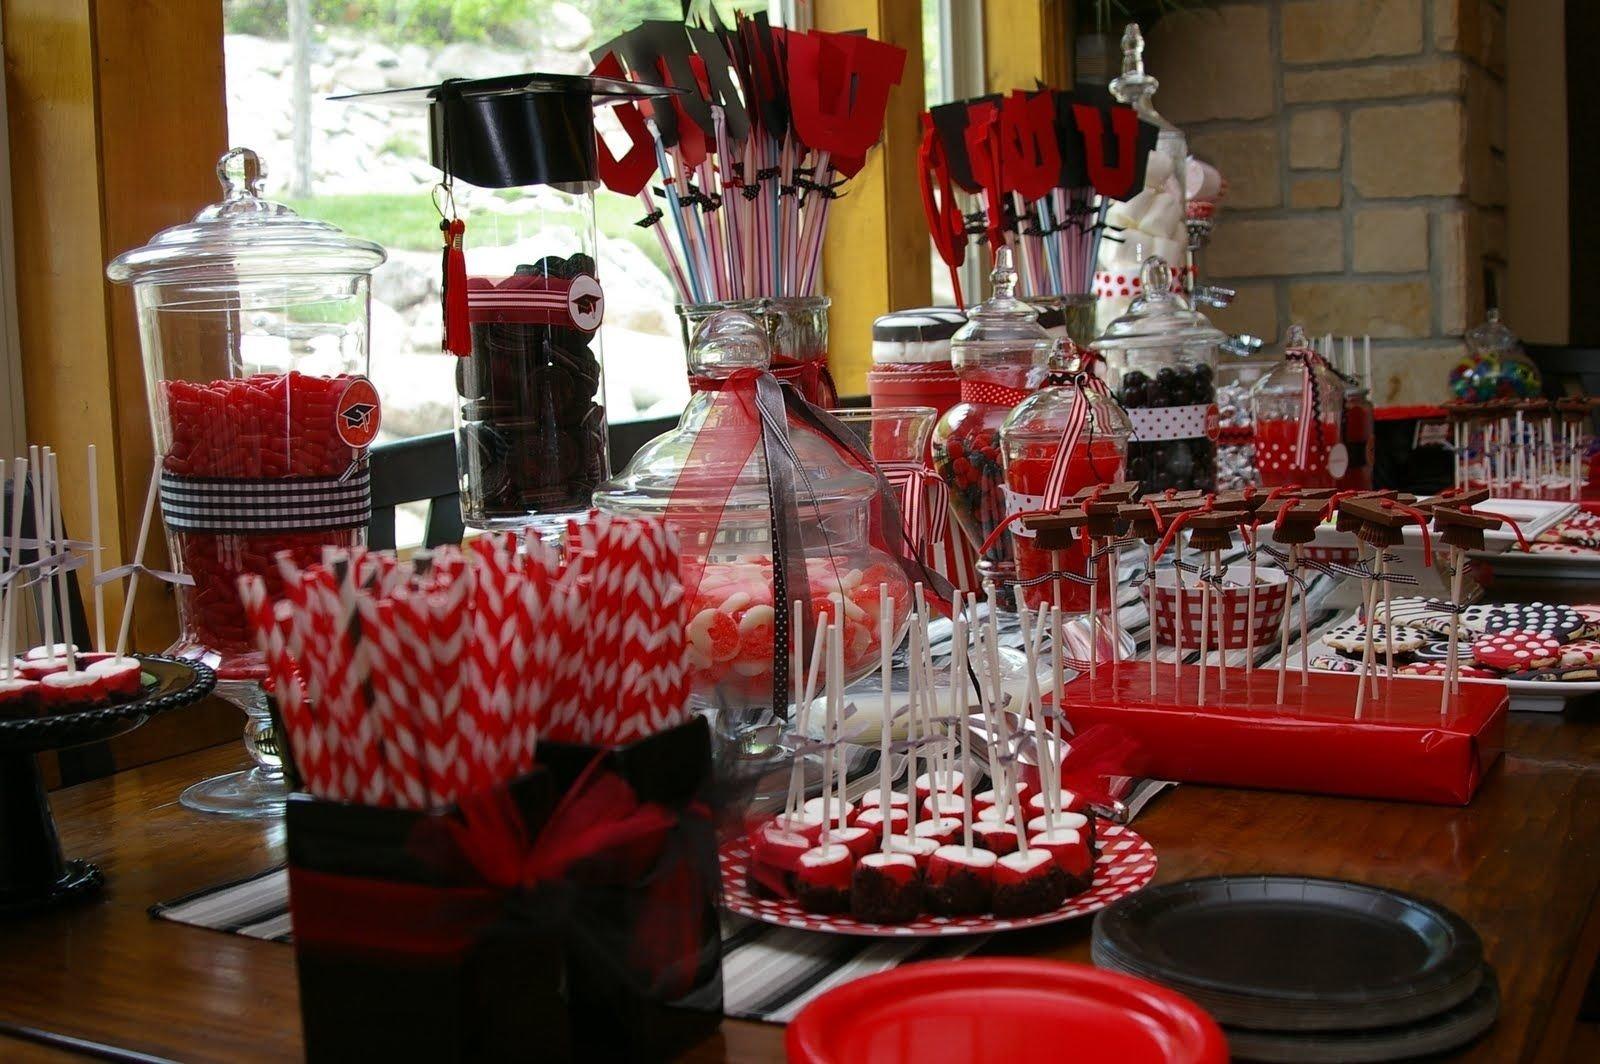 10 Fabulous Graduation Party Ideas For High School high school graduation party ideas bridgey widgey graduation 1